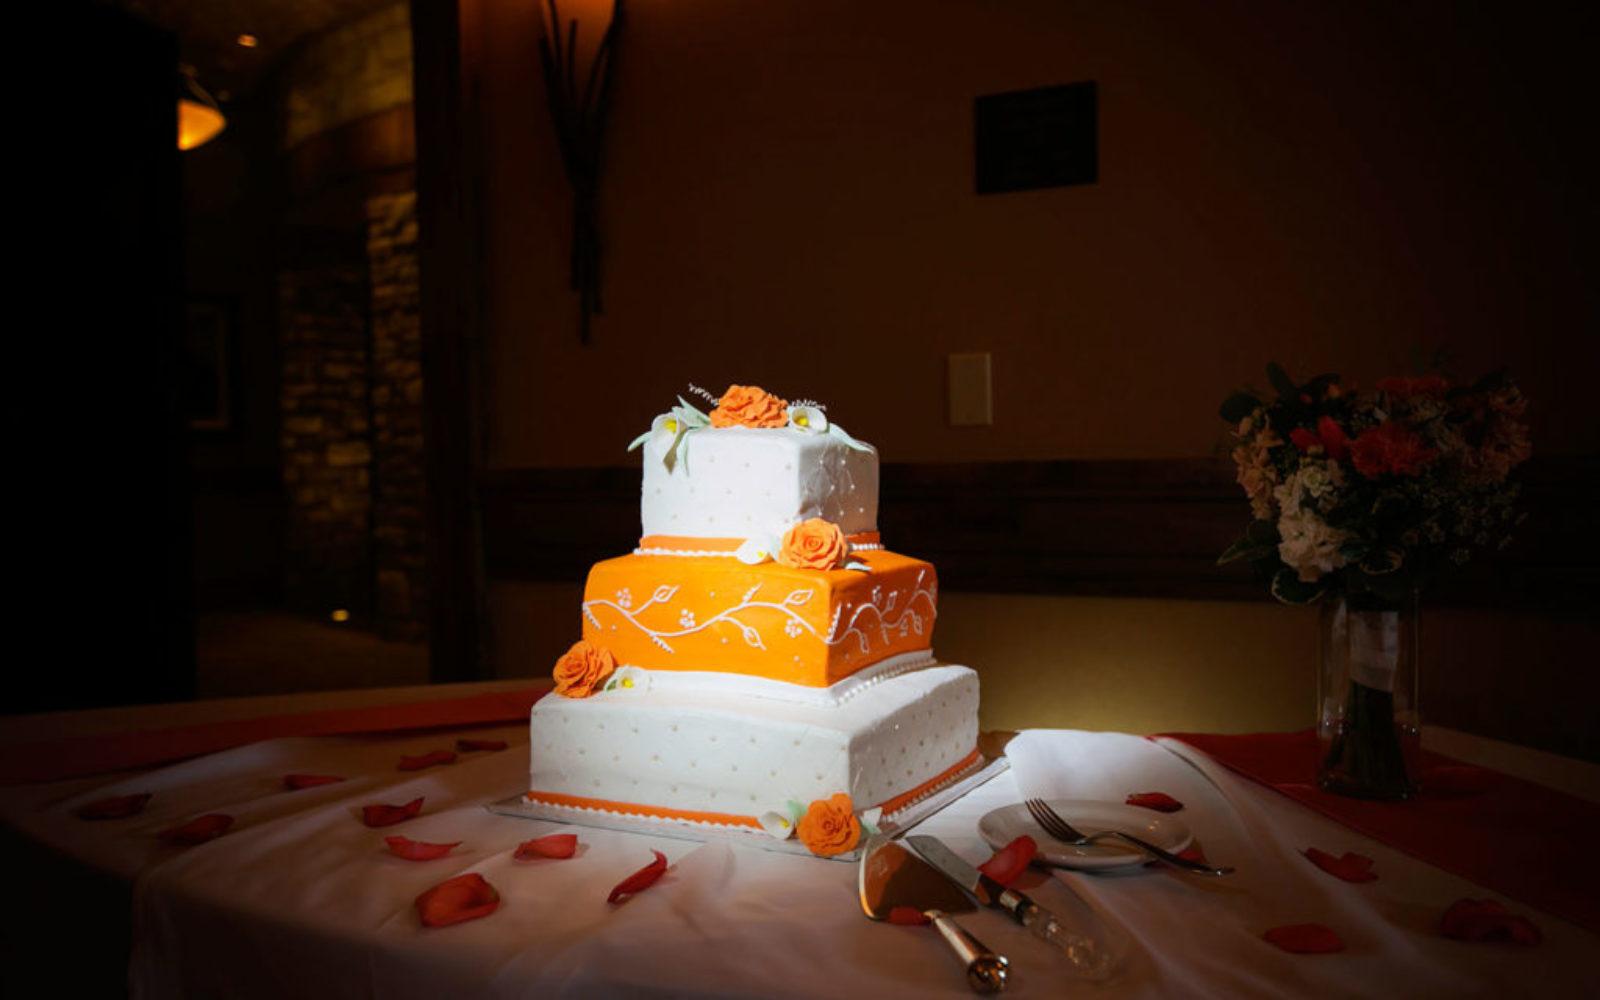 weddingphotographycoloradosprings_64-1024x640